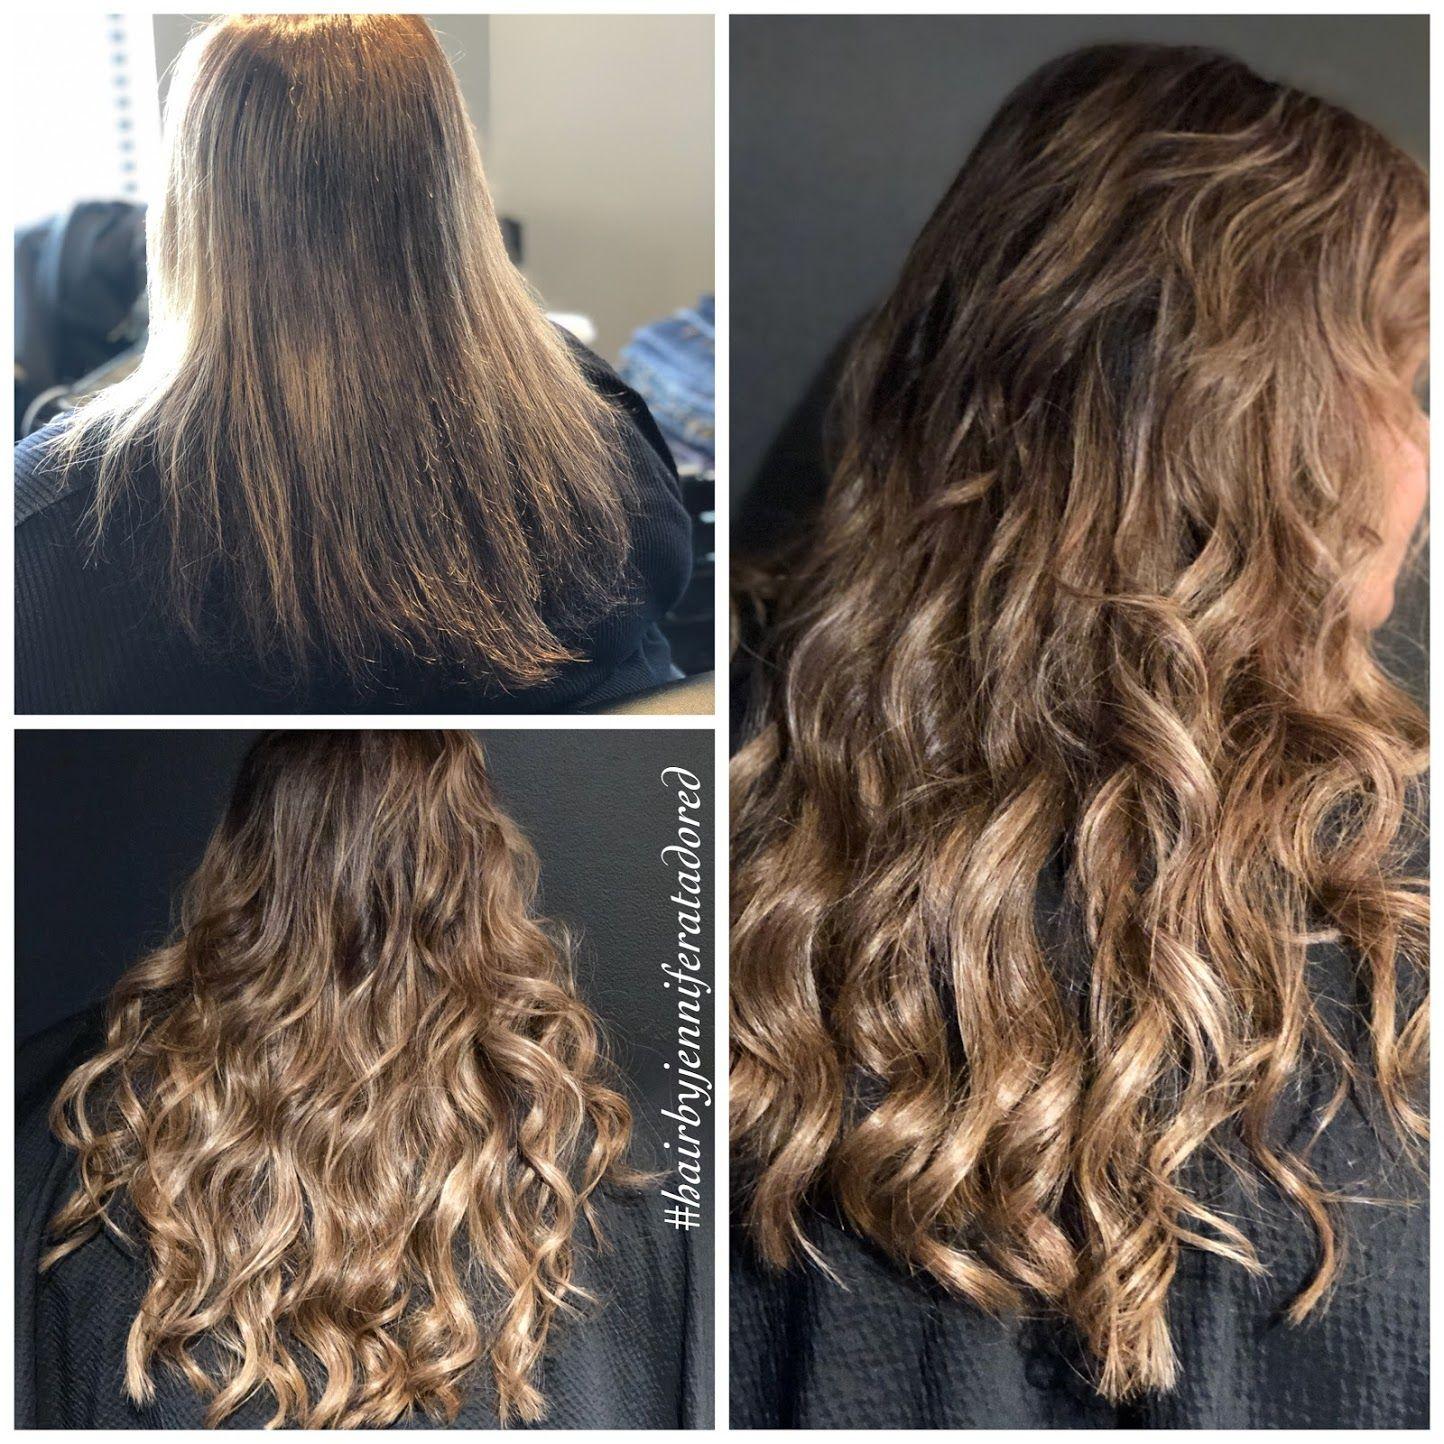 Hair Extensions By Adored Salon Hair Extensions Options Curly Hair Salon Hair Extensions